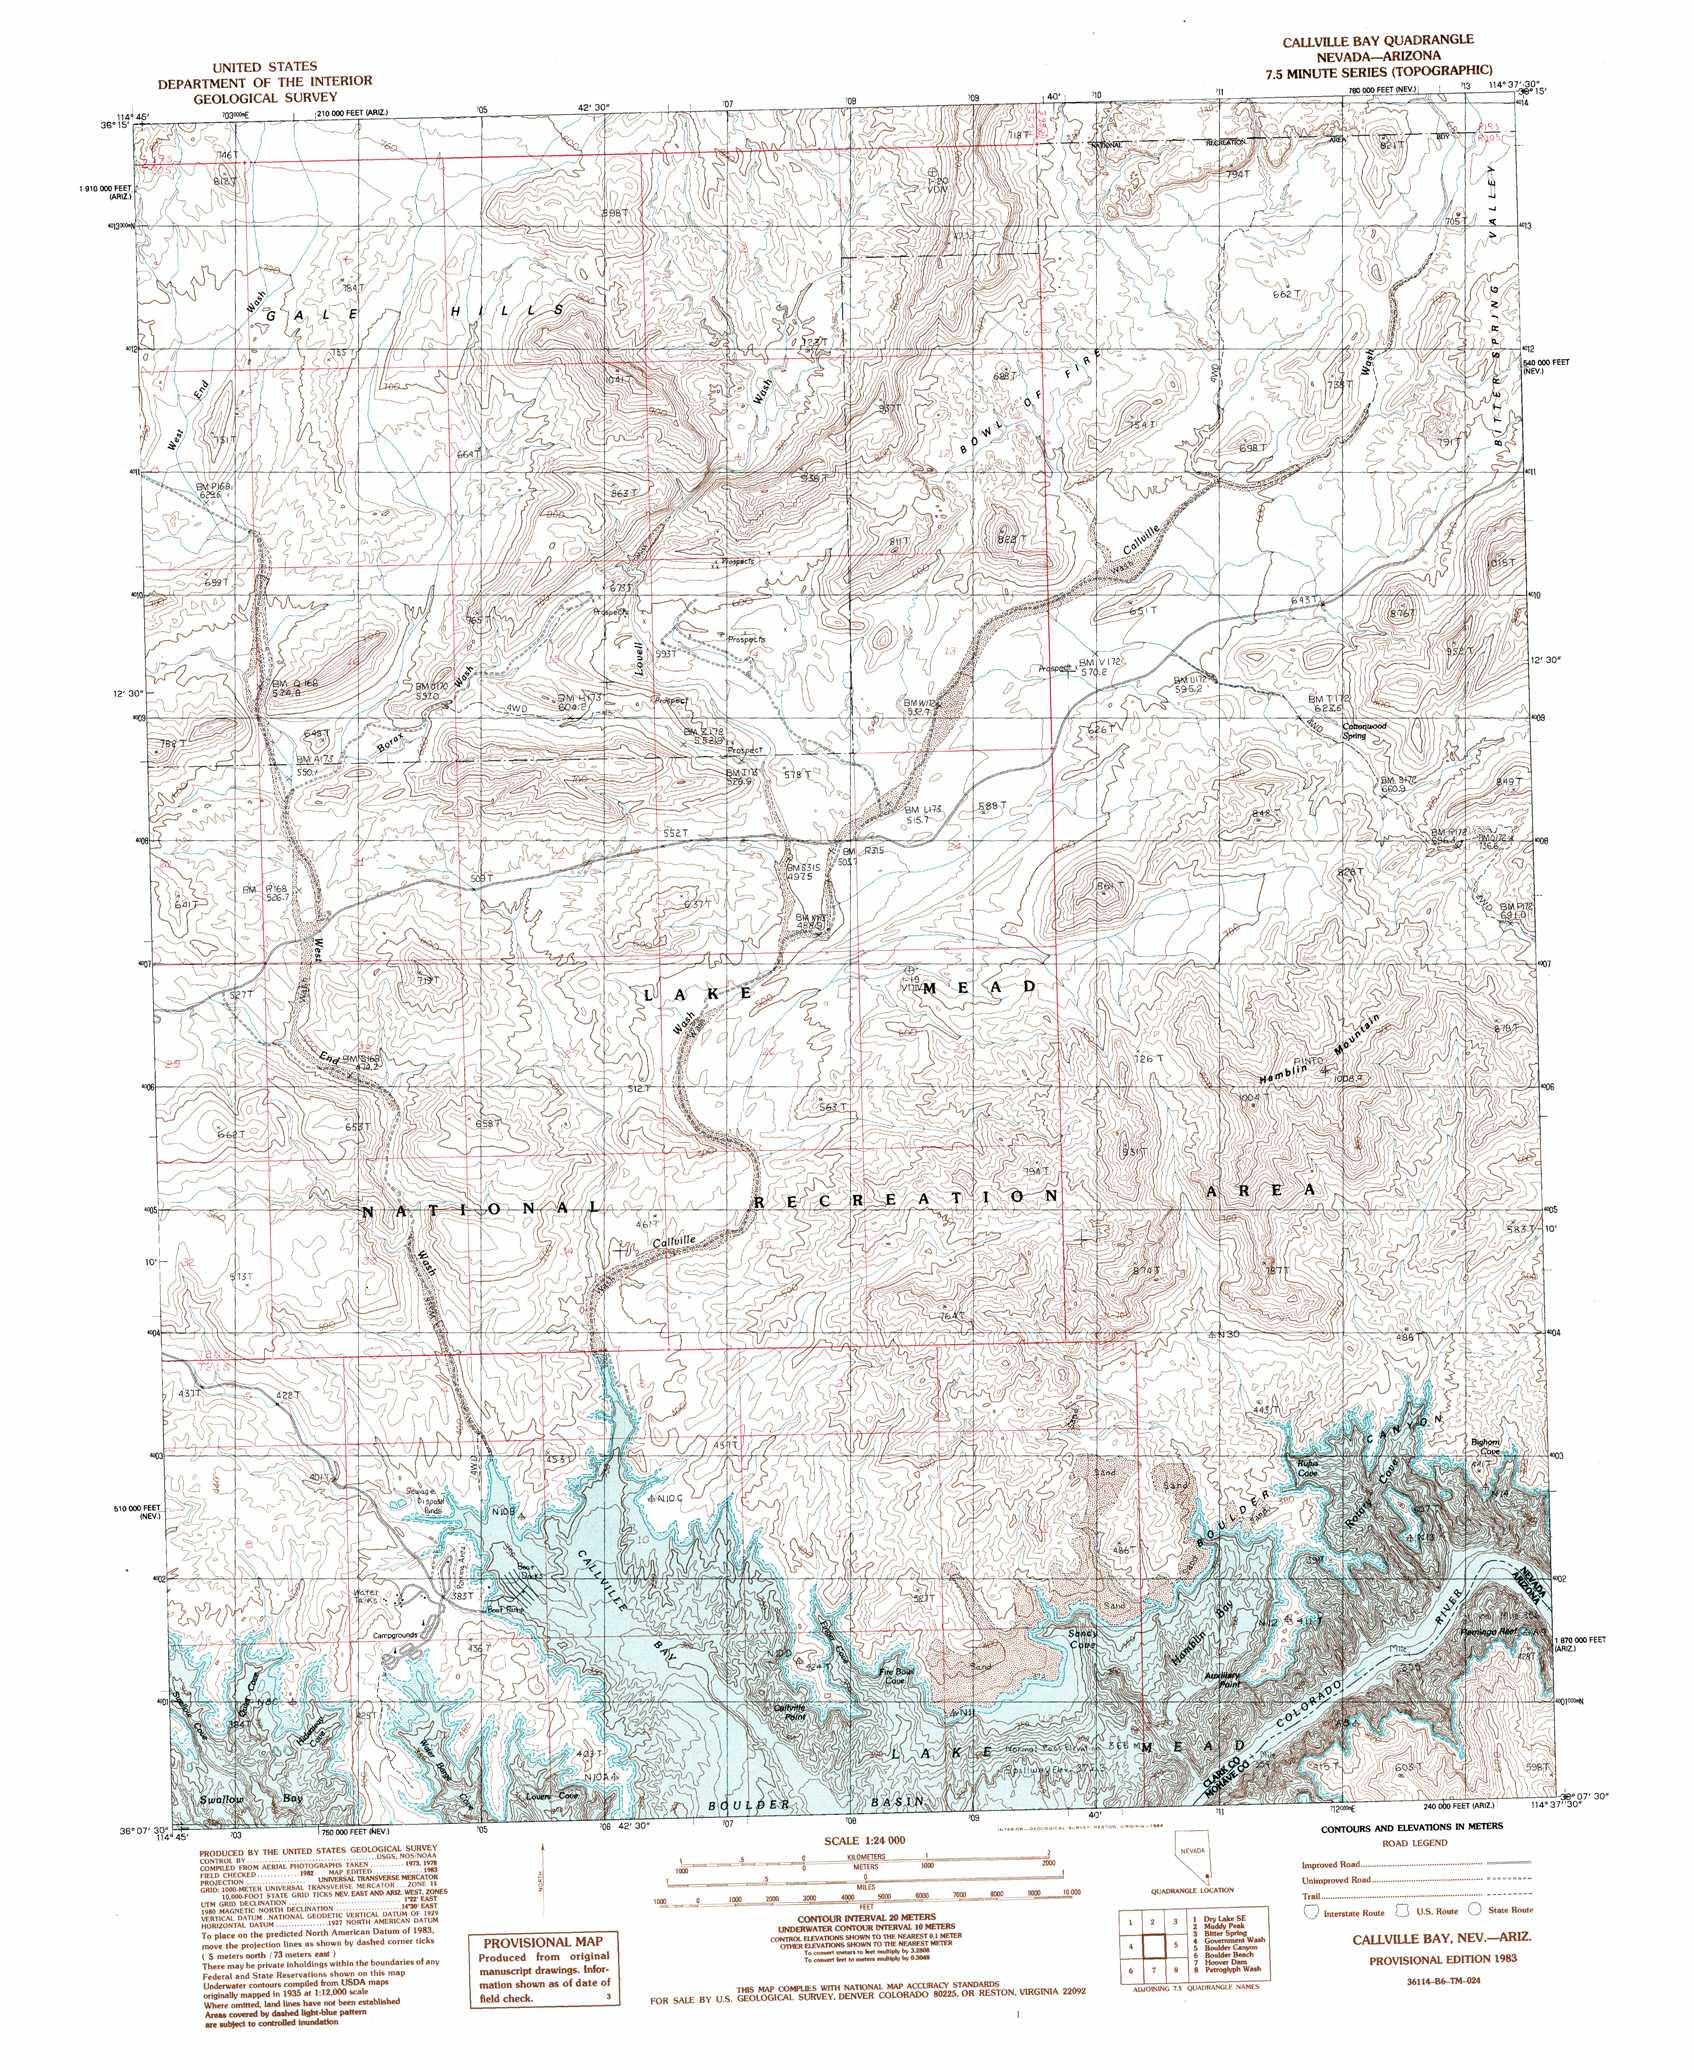 Callville Bay topographic map NV AZ USGS Topo Quad 36114b6